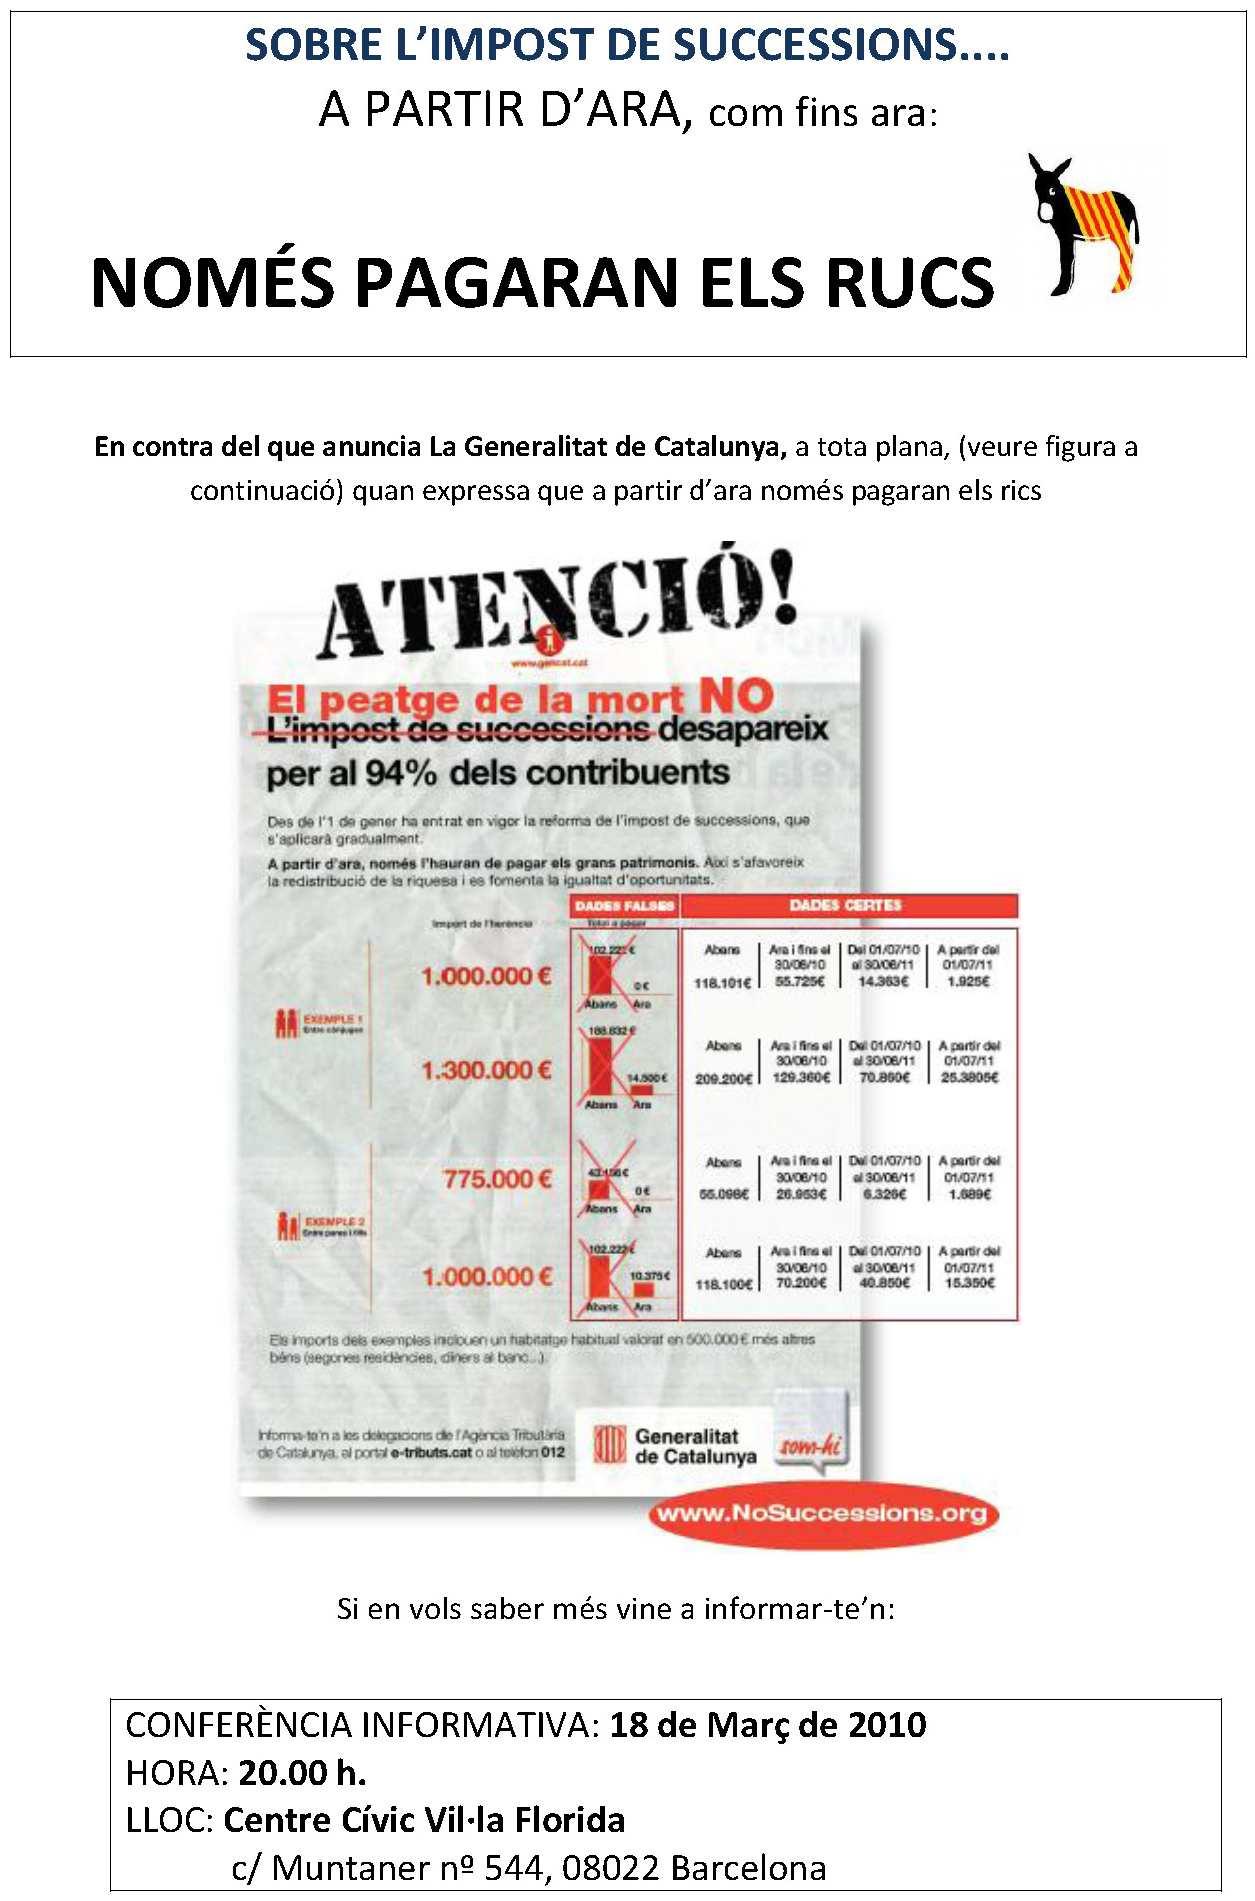 18 MARÇ - CONFERÈNCIA ARIS - SARRIÀ/ST. GERVASI - 20.00 h RucsL